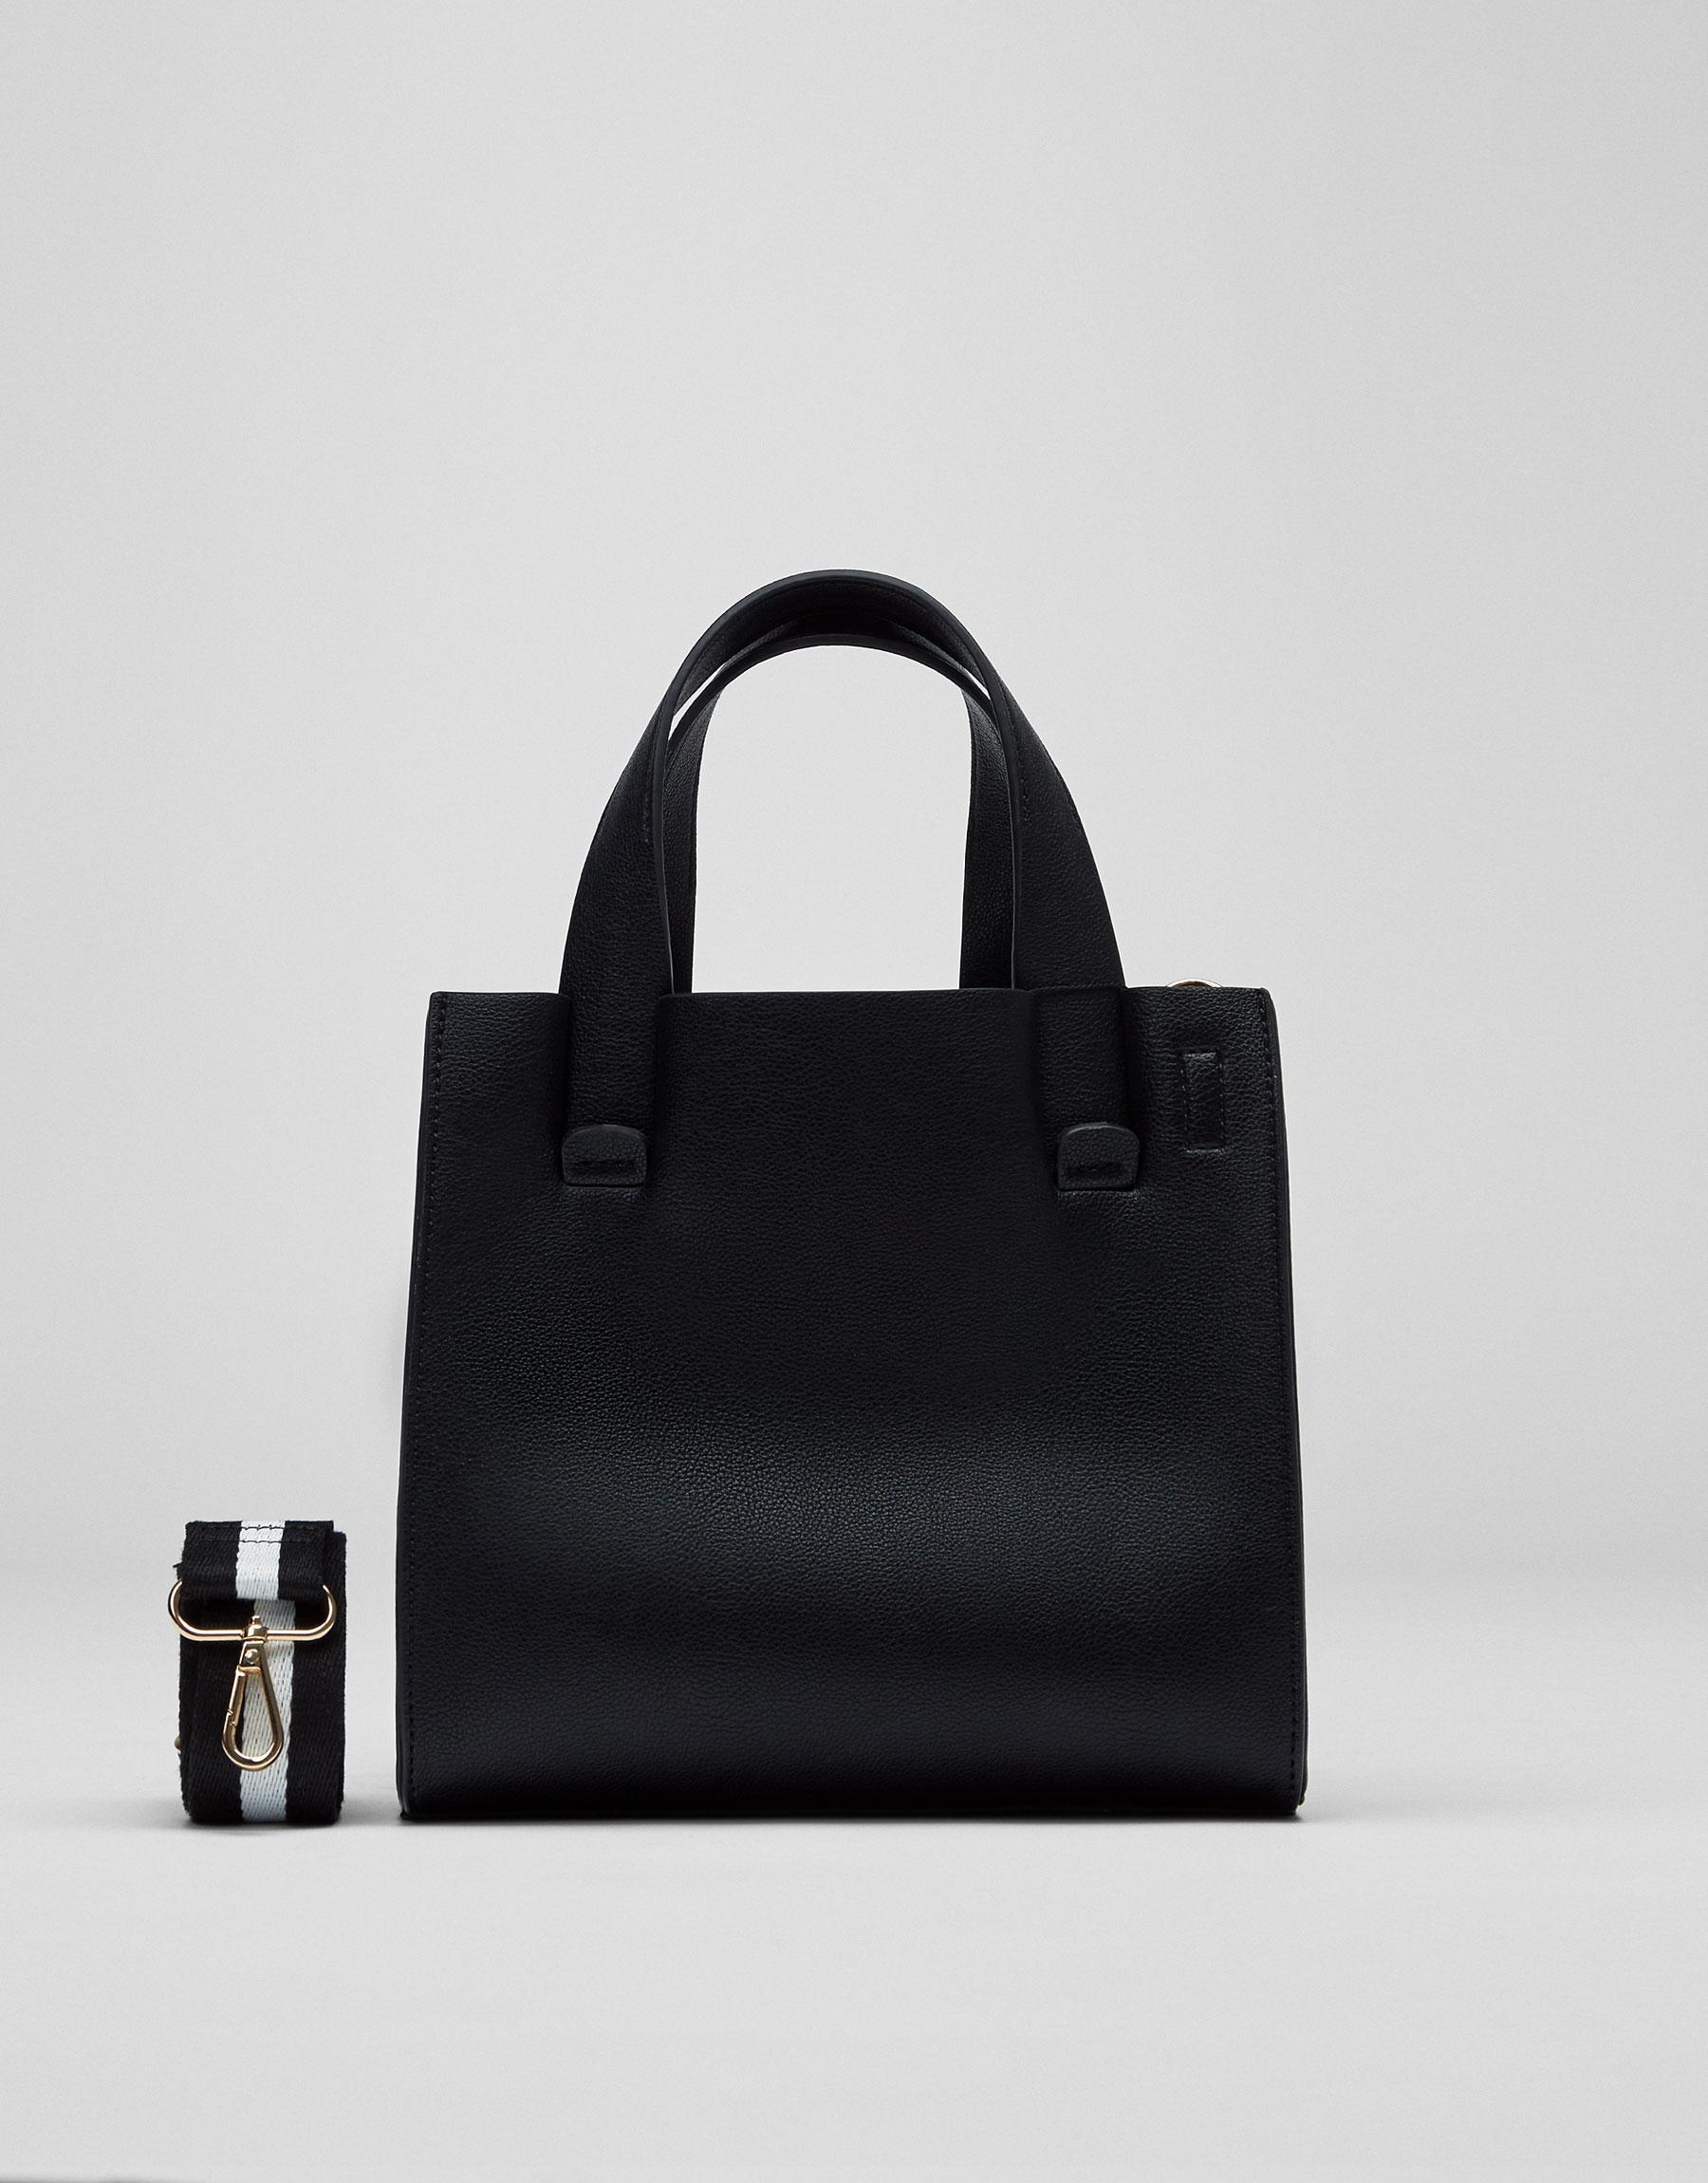 Basic Tote Bag - £19.95 Pull & Bear